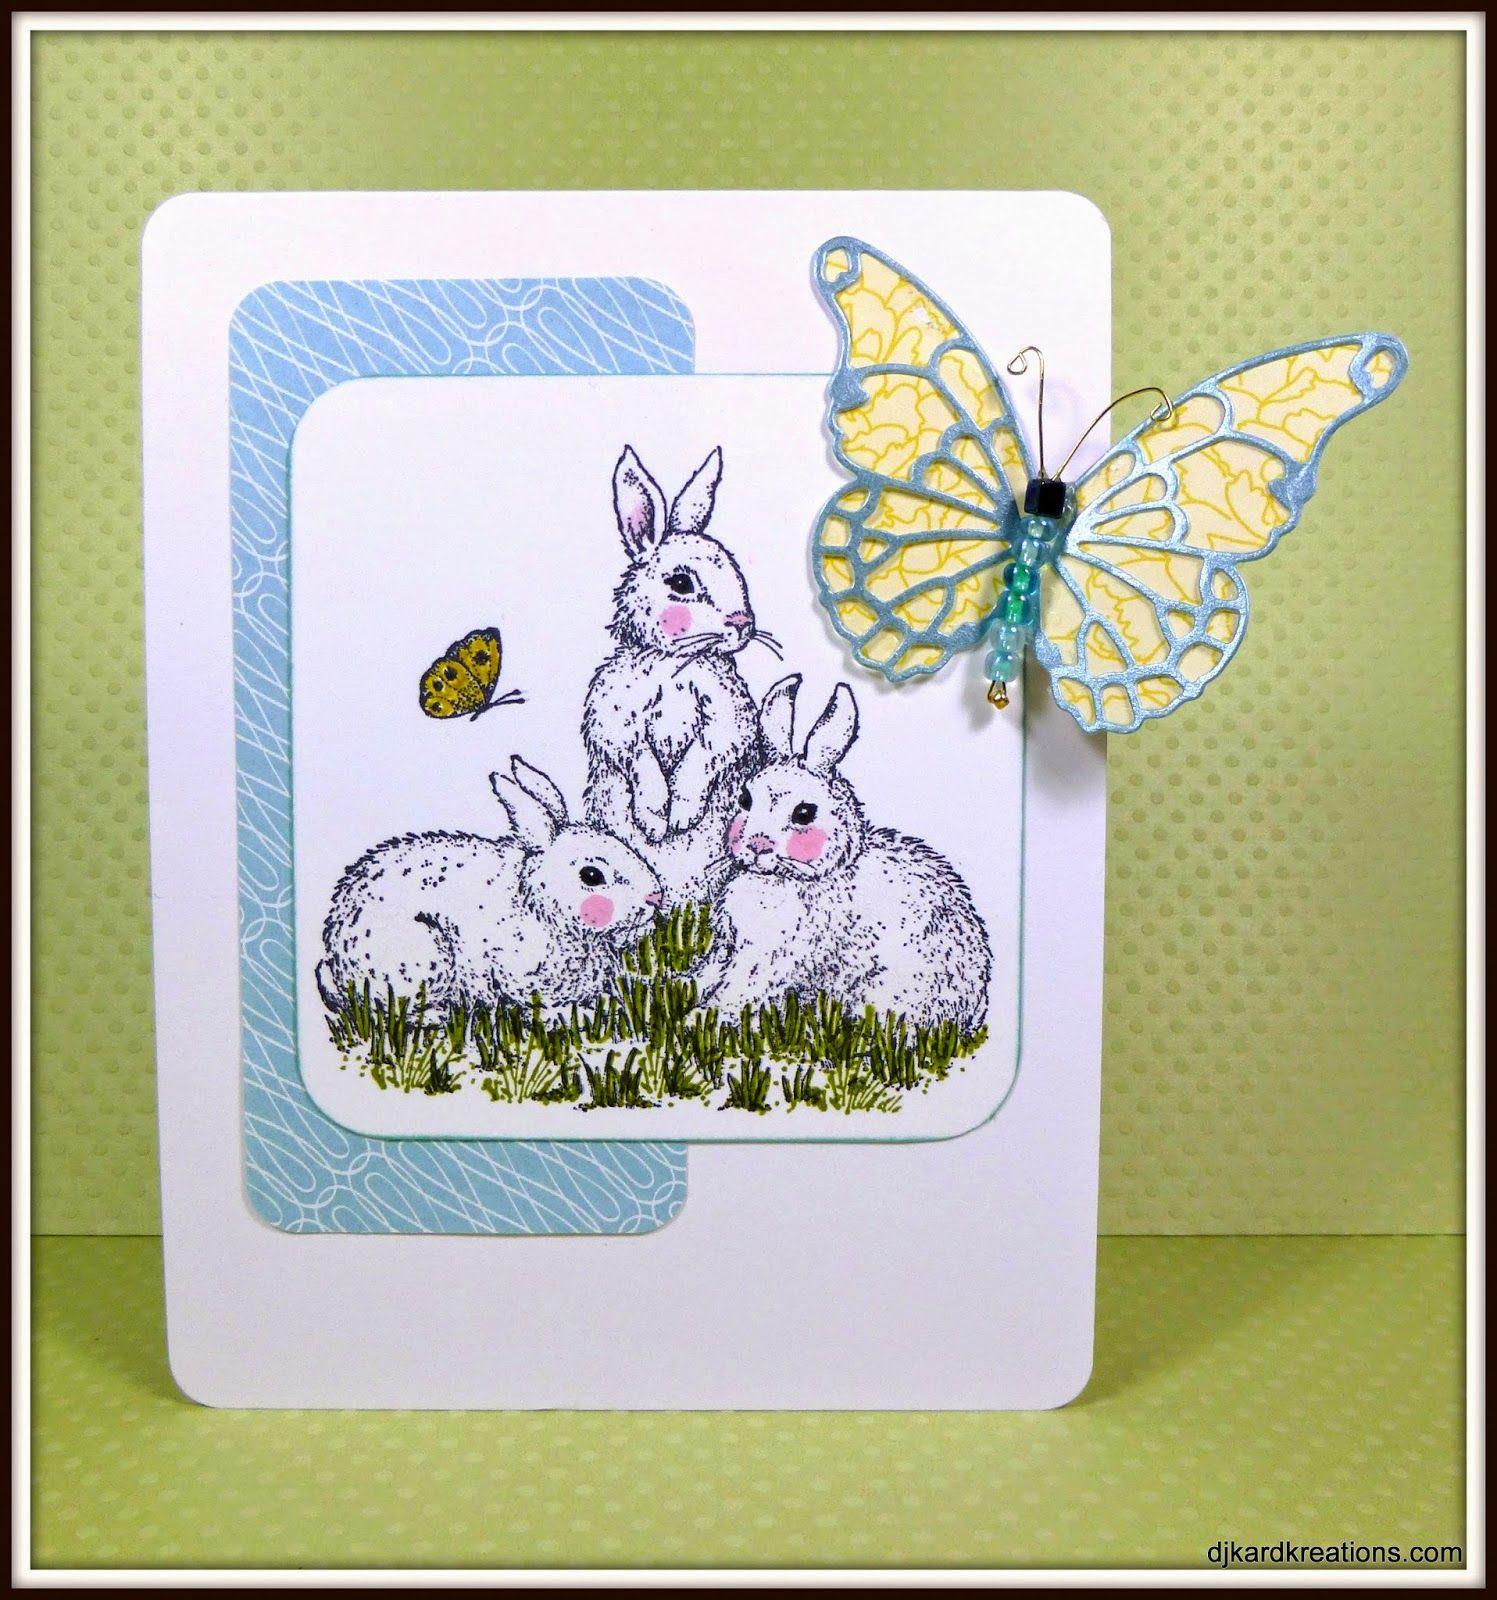 Bunnies and Butterflies By djkardkreations